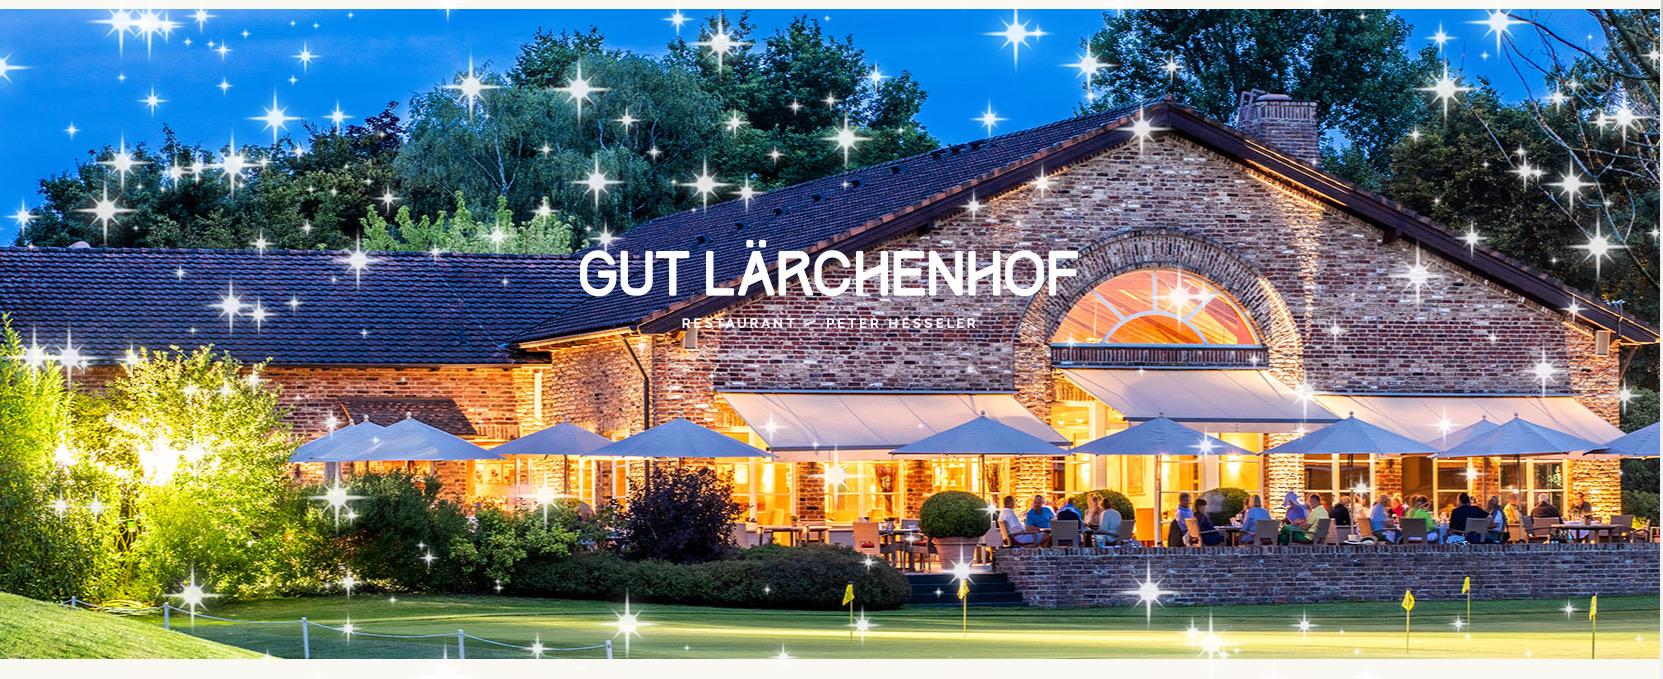 silvester laerchenhof1